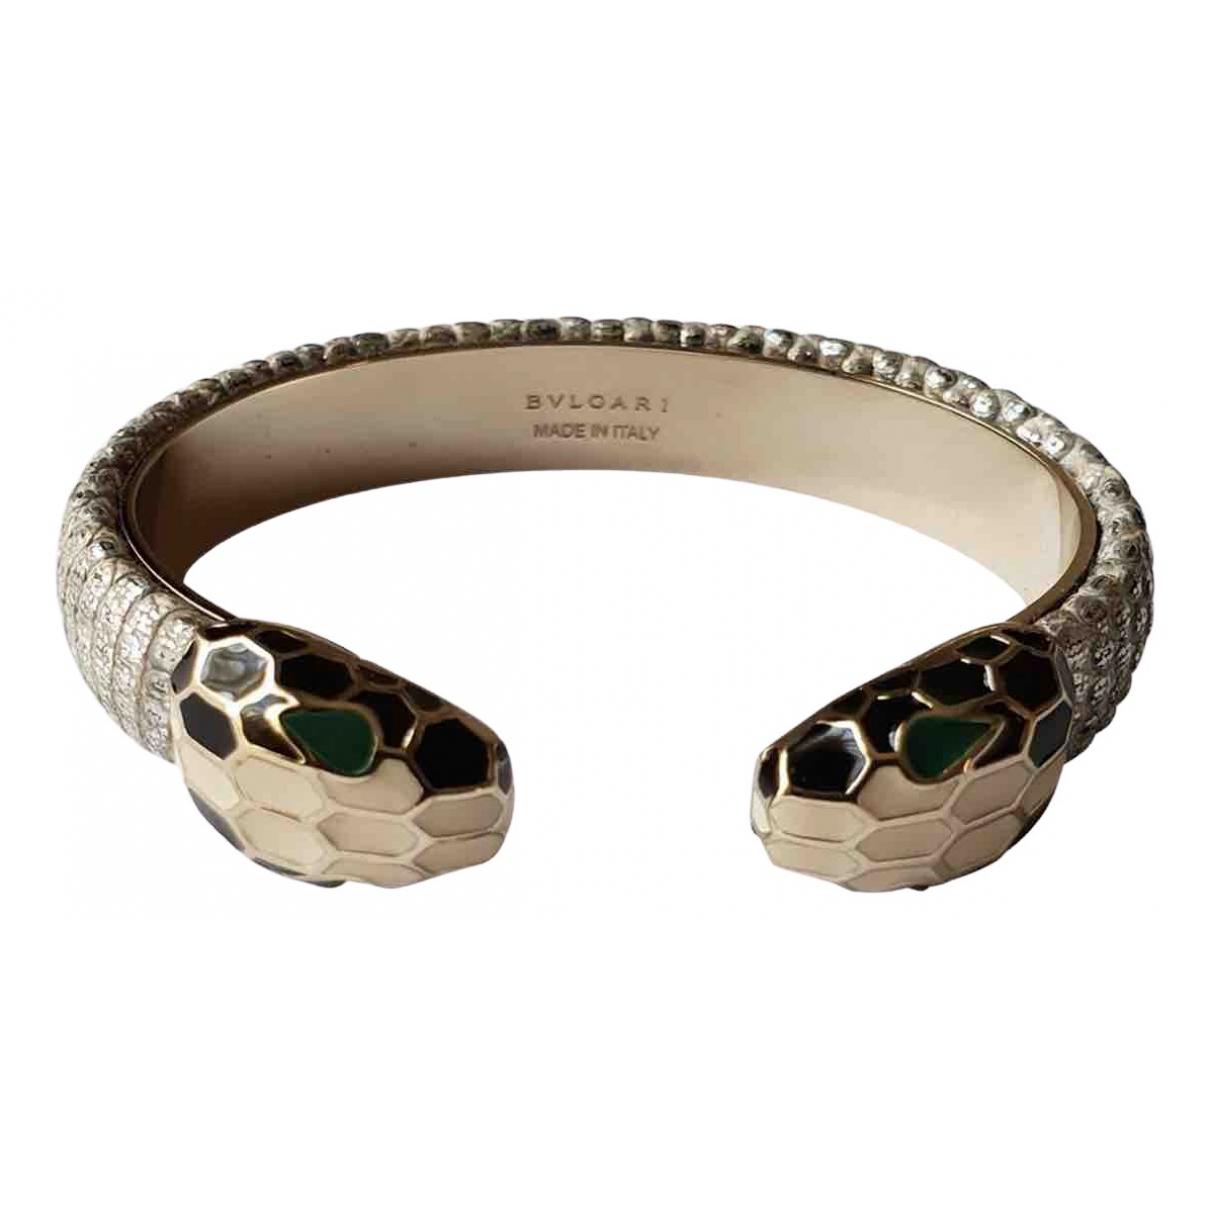 Bvlgari Serpenti Armband in  Silber Leder